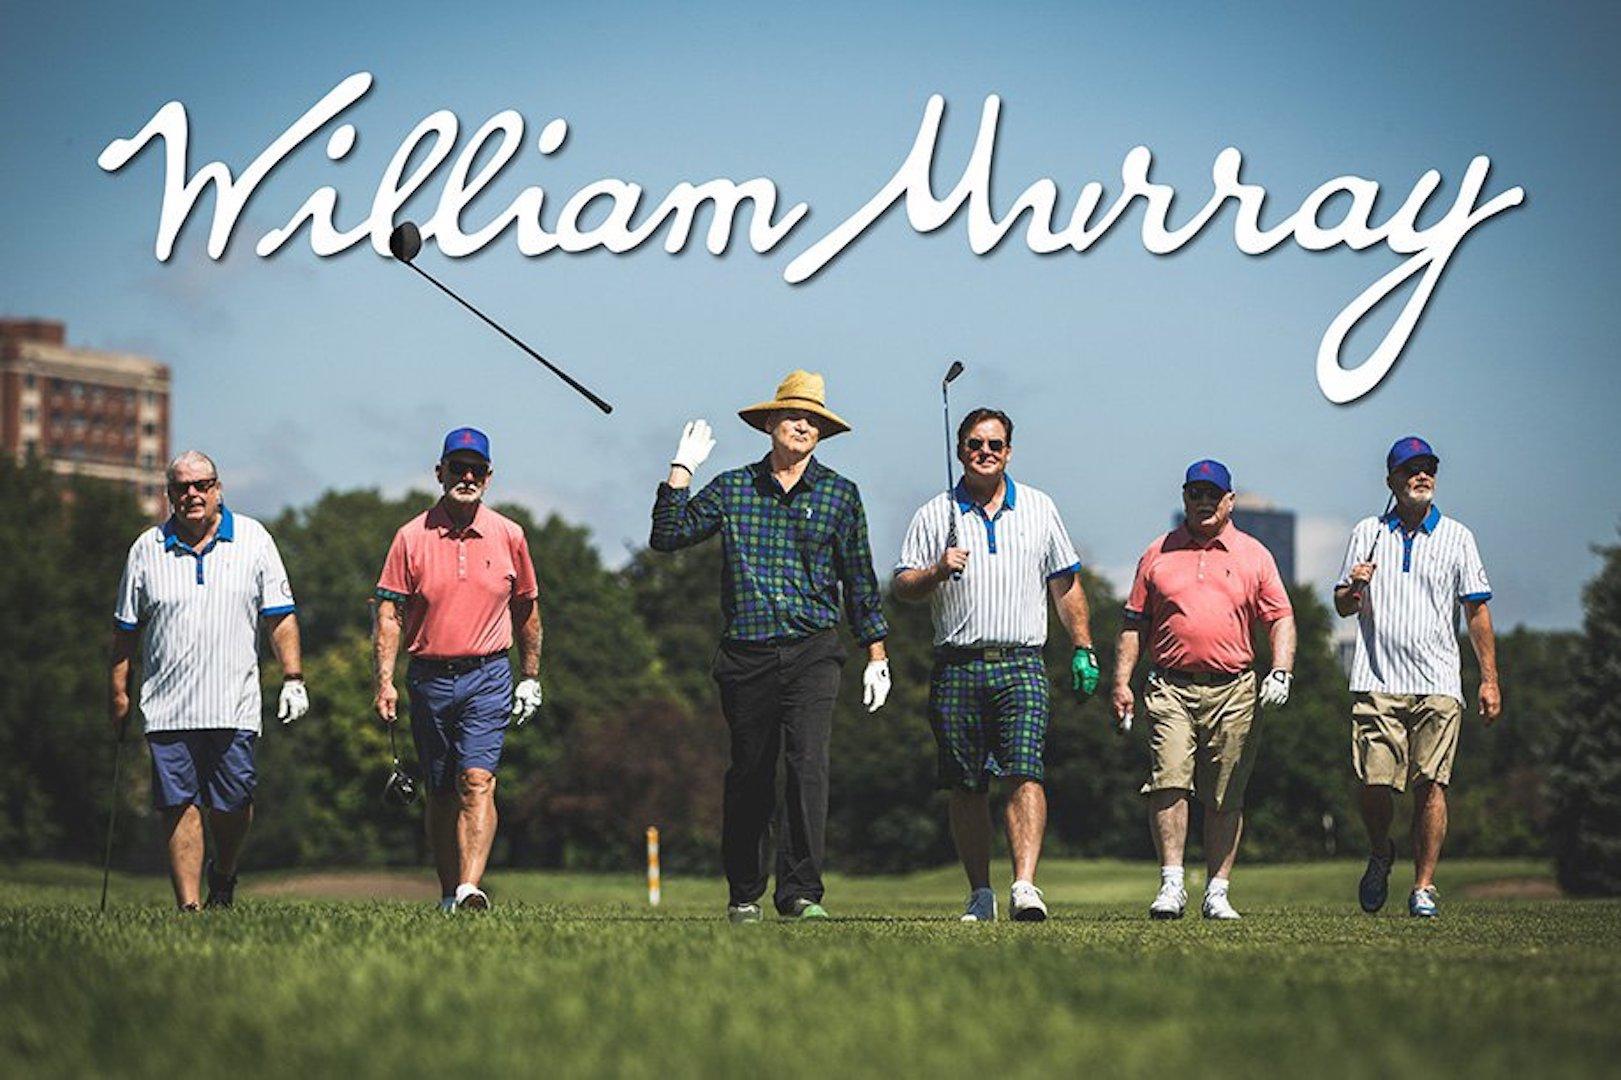 Bill Murray's golf clothing brand raises $1 million